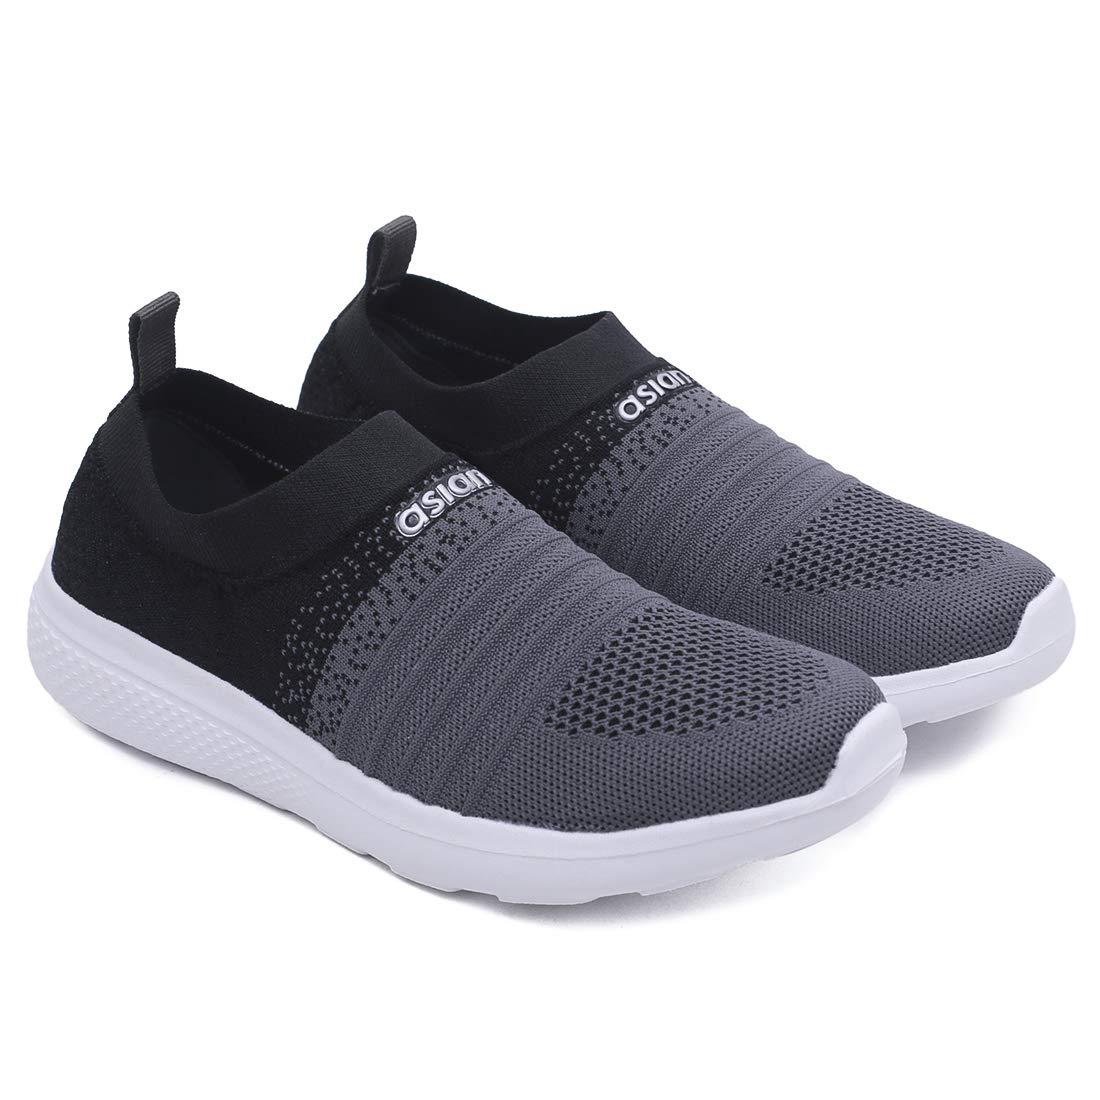 popular women's casual shoes 219